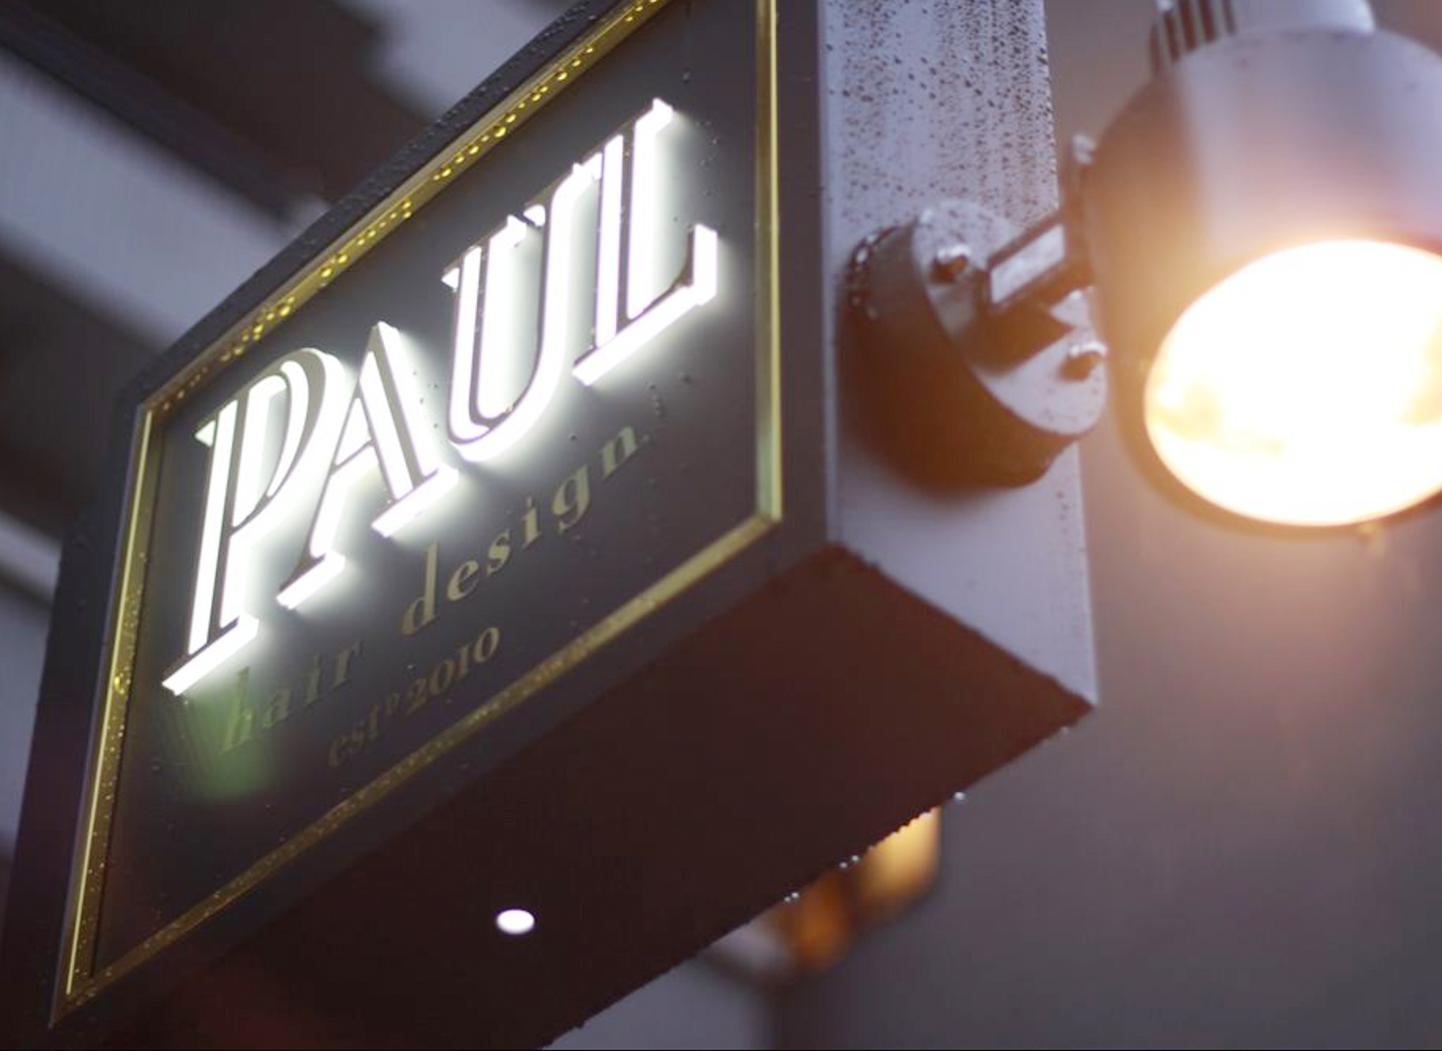 pawl6 - 愛と感動と感謝をあなたに。┃西葛西の美容室PAUL